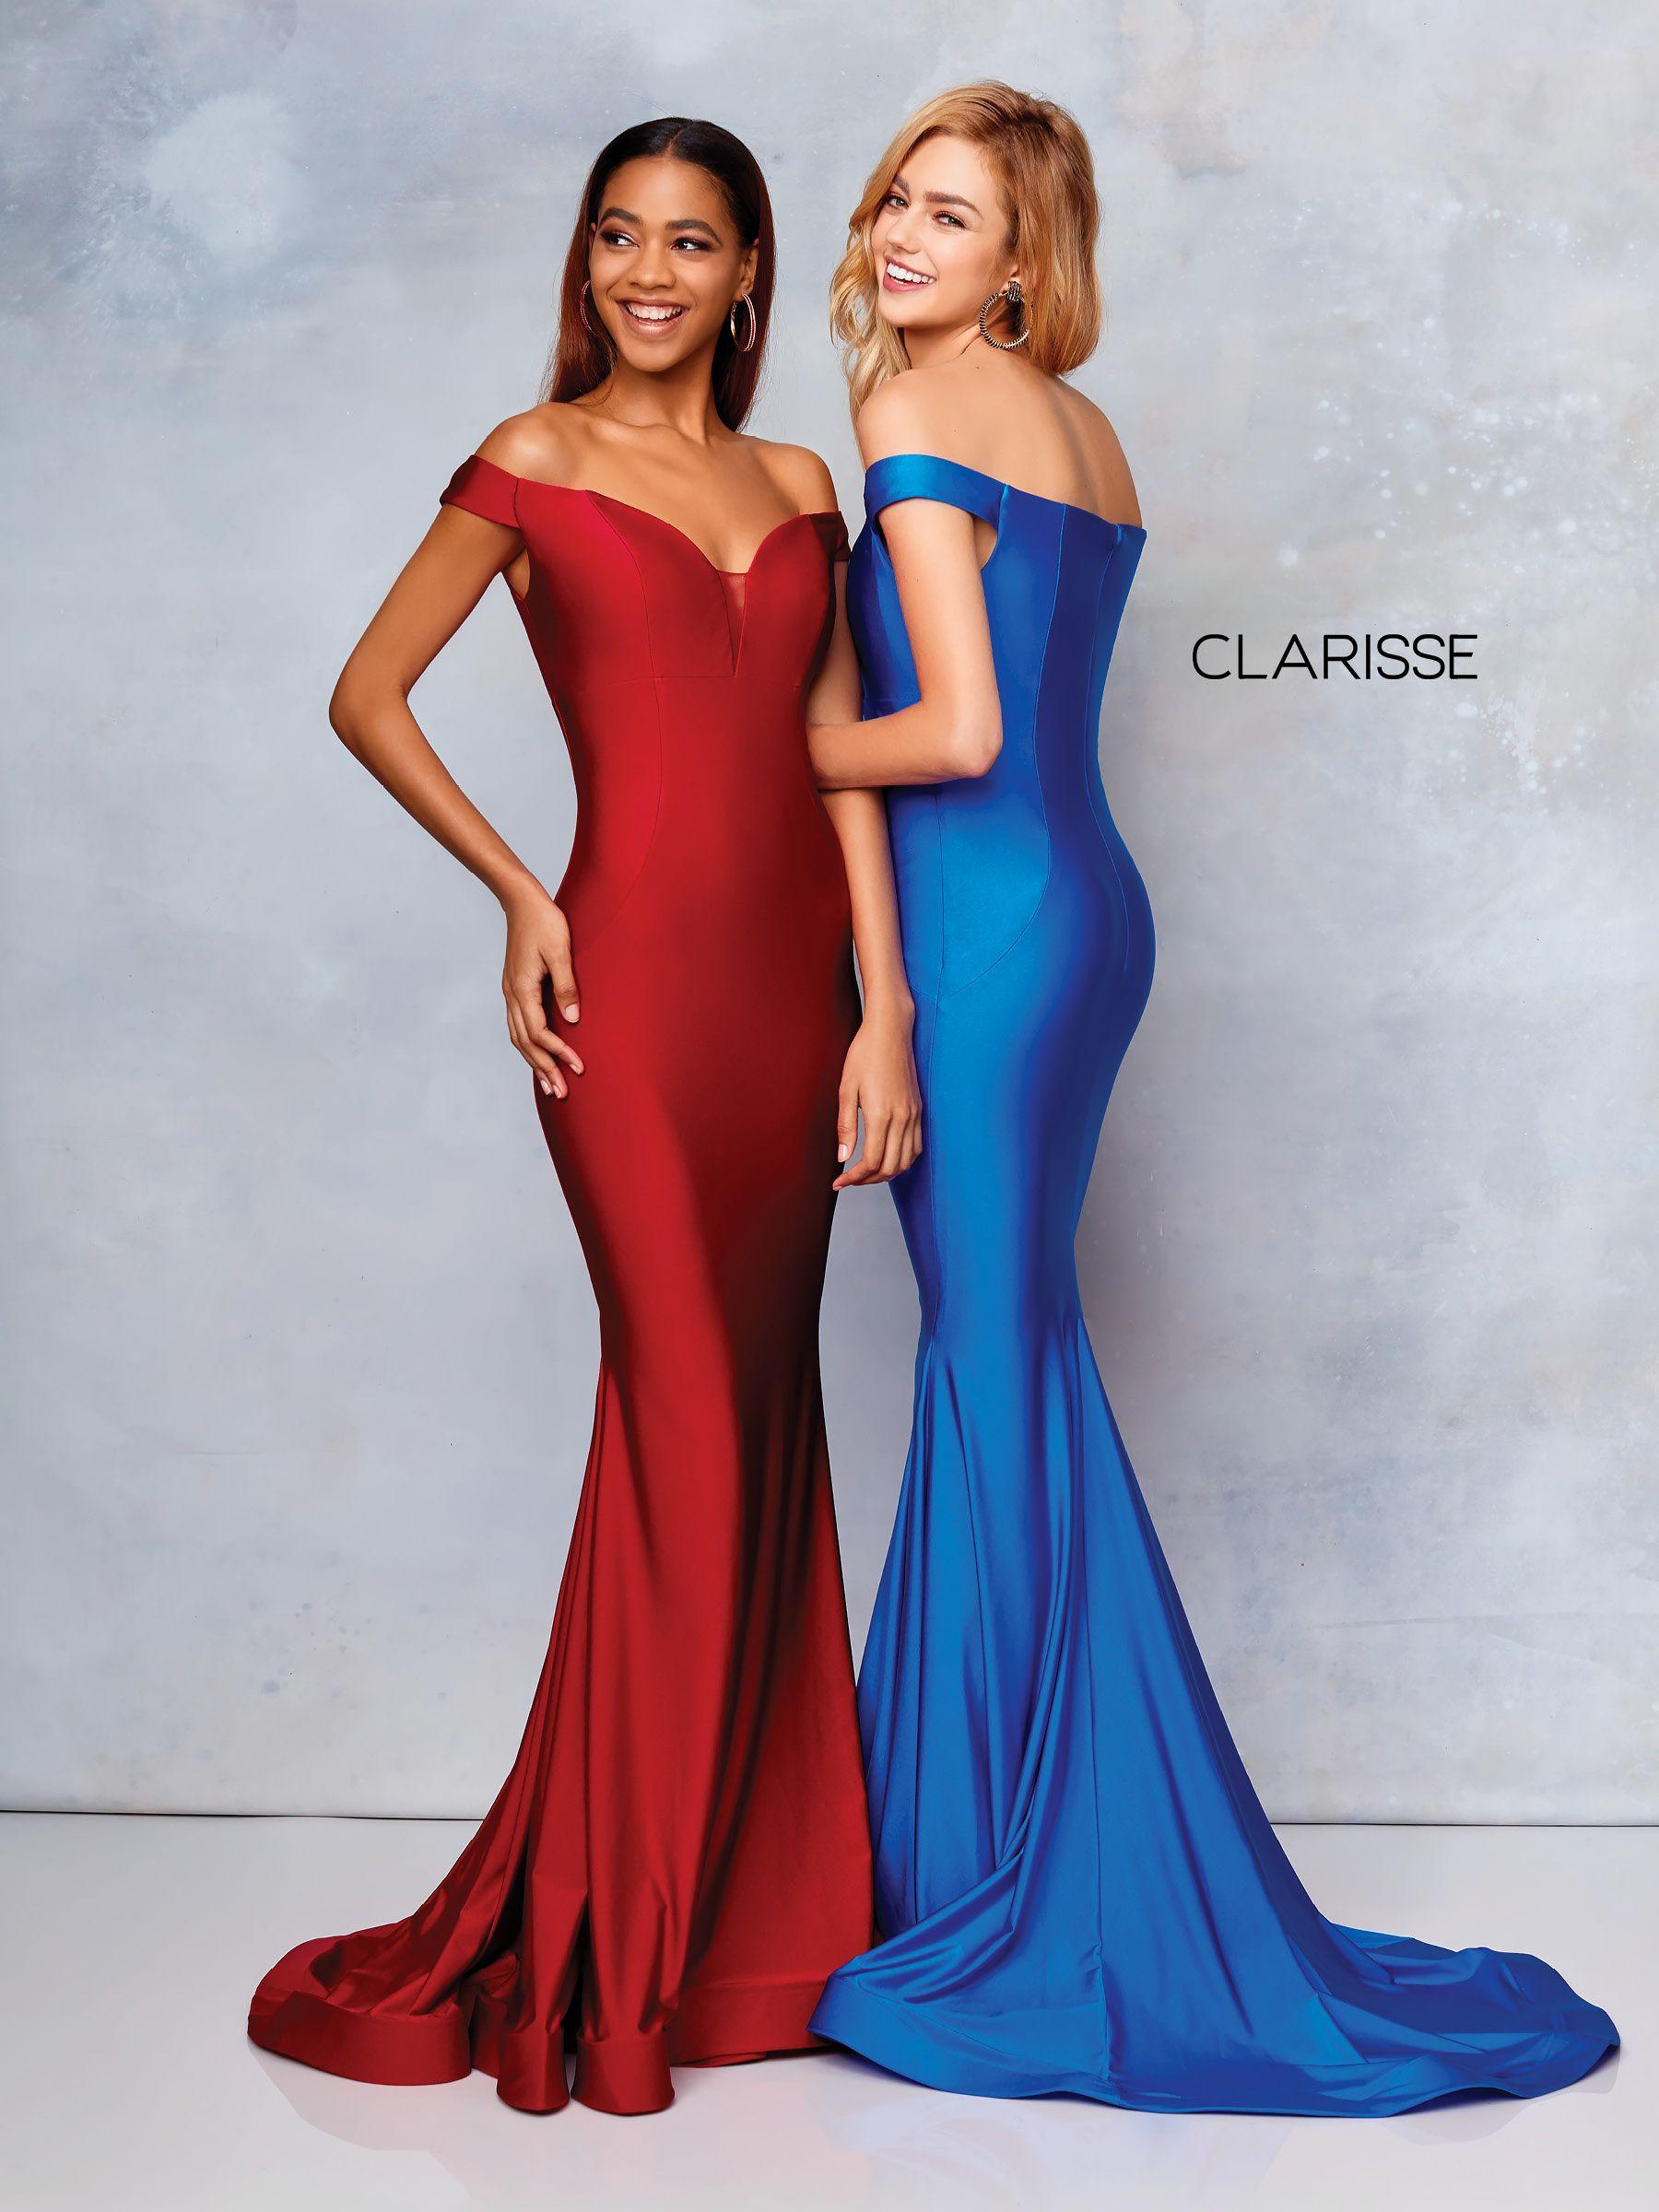 af3718ca4c18 3845 - Scarlet Red and Electric Blue